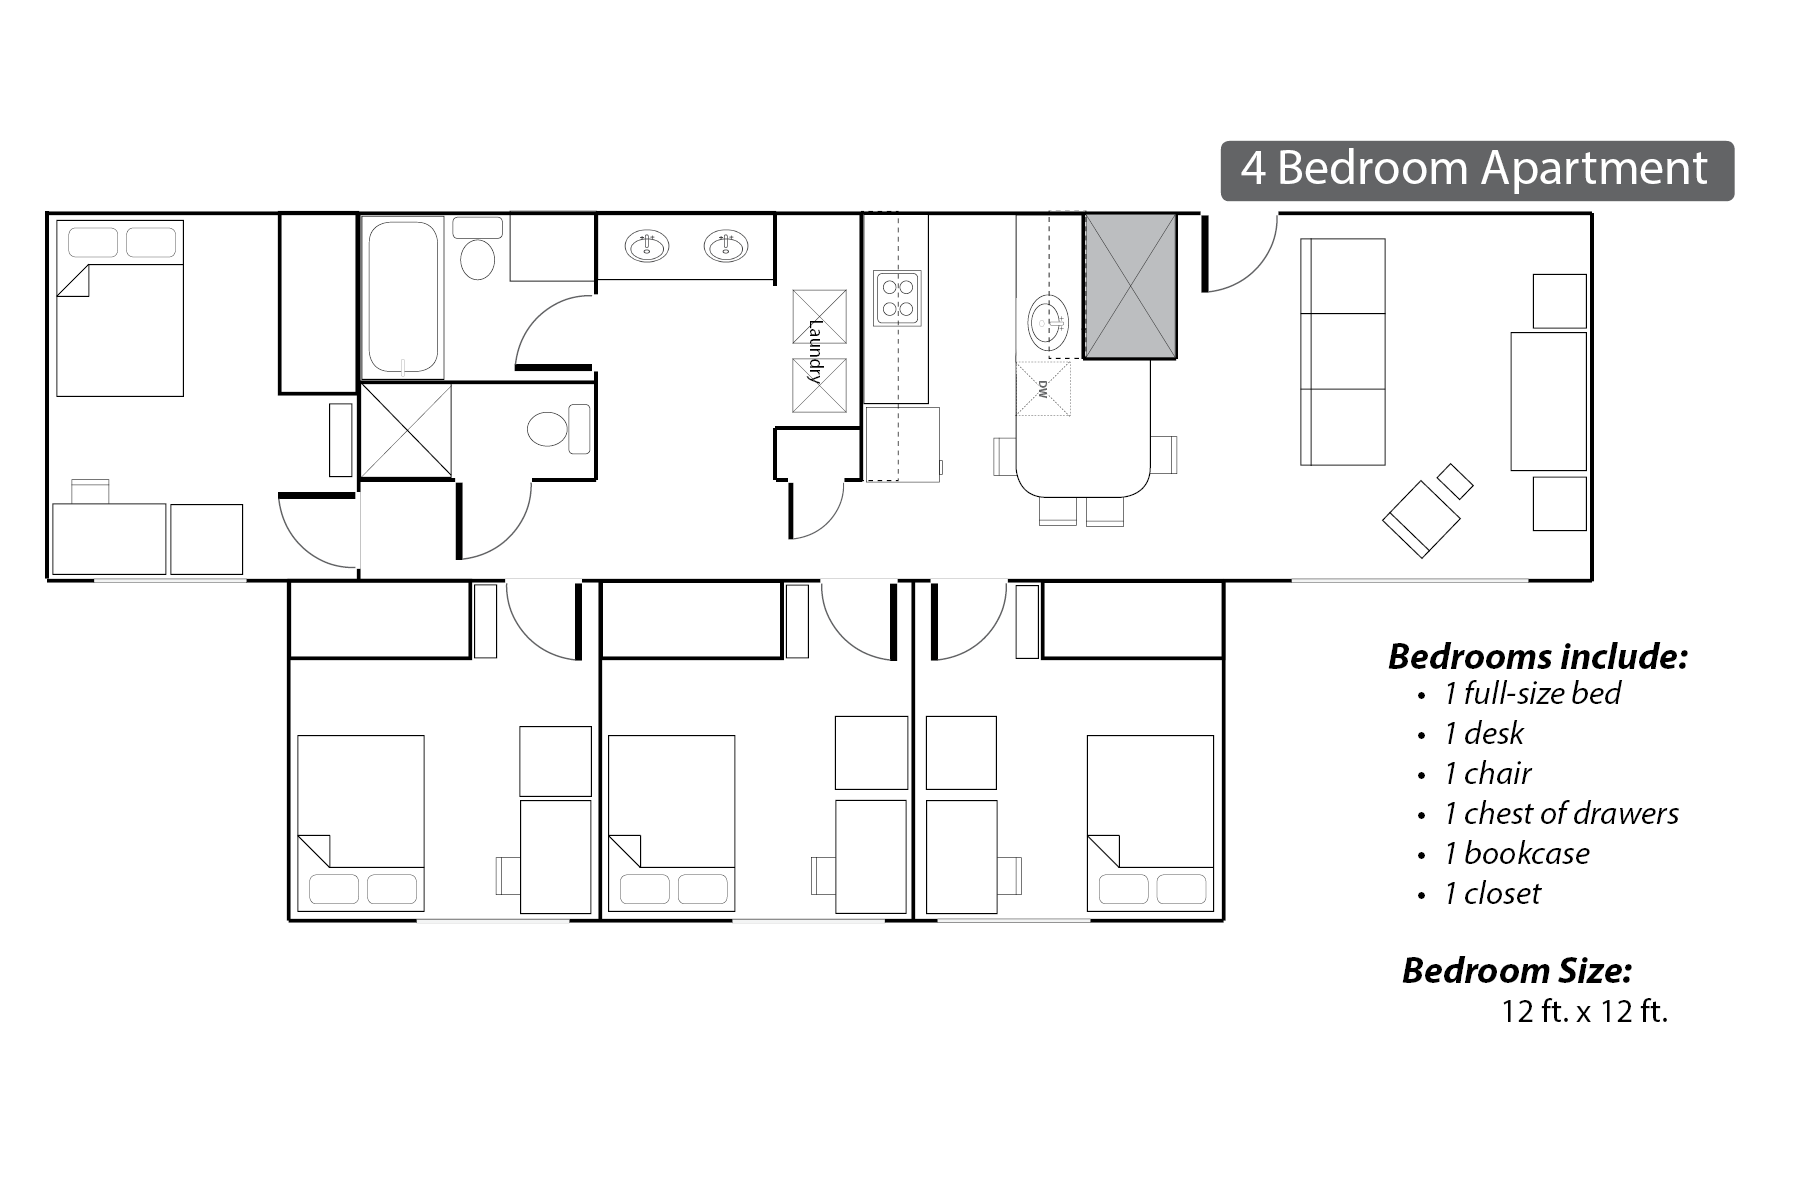 commons apartments four bedroom floor plan